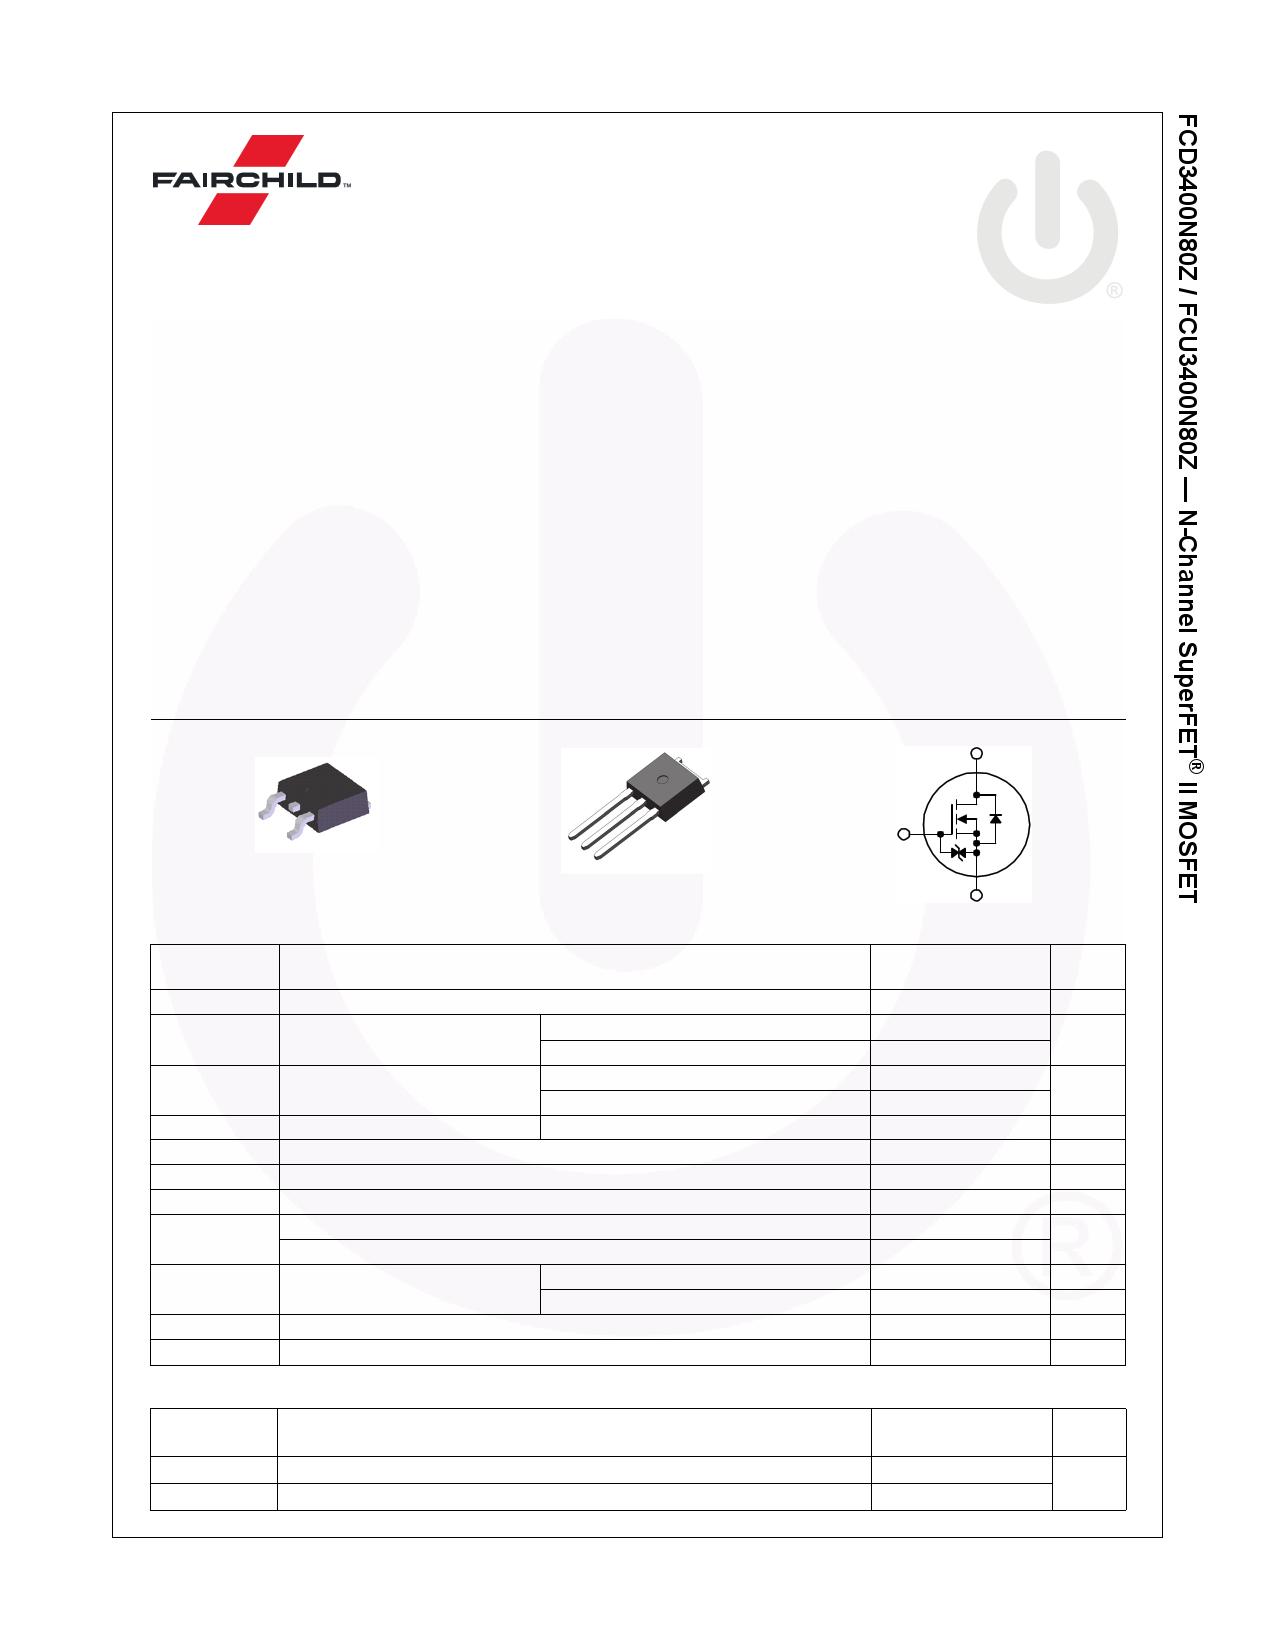 FCU3400N80Z datasheet